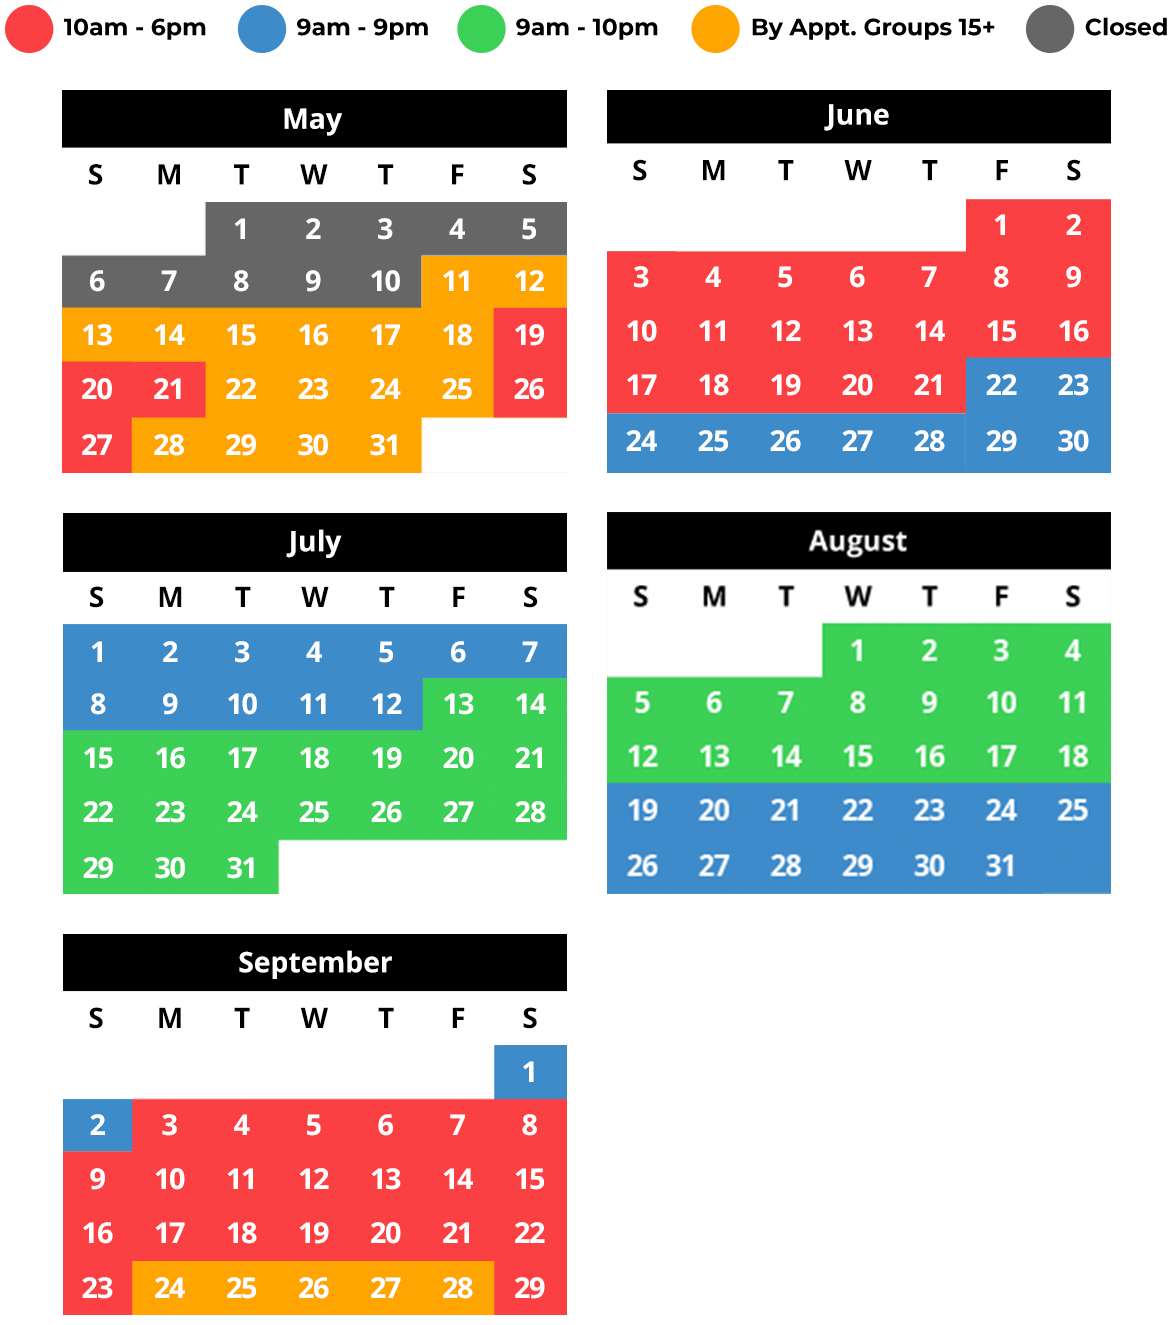 mcb-calendar-2018